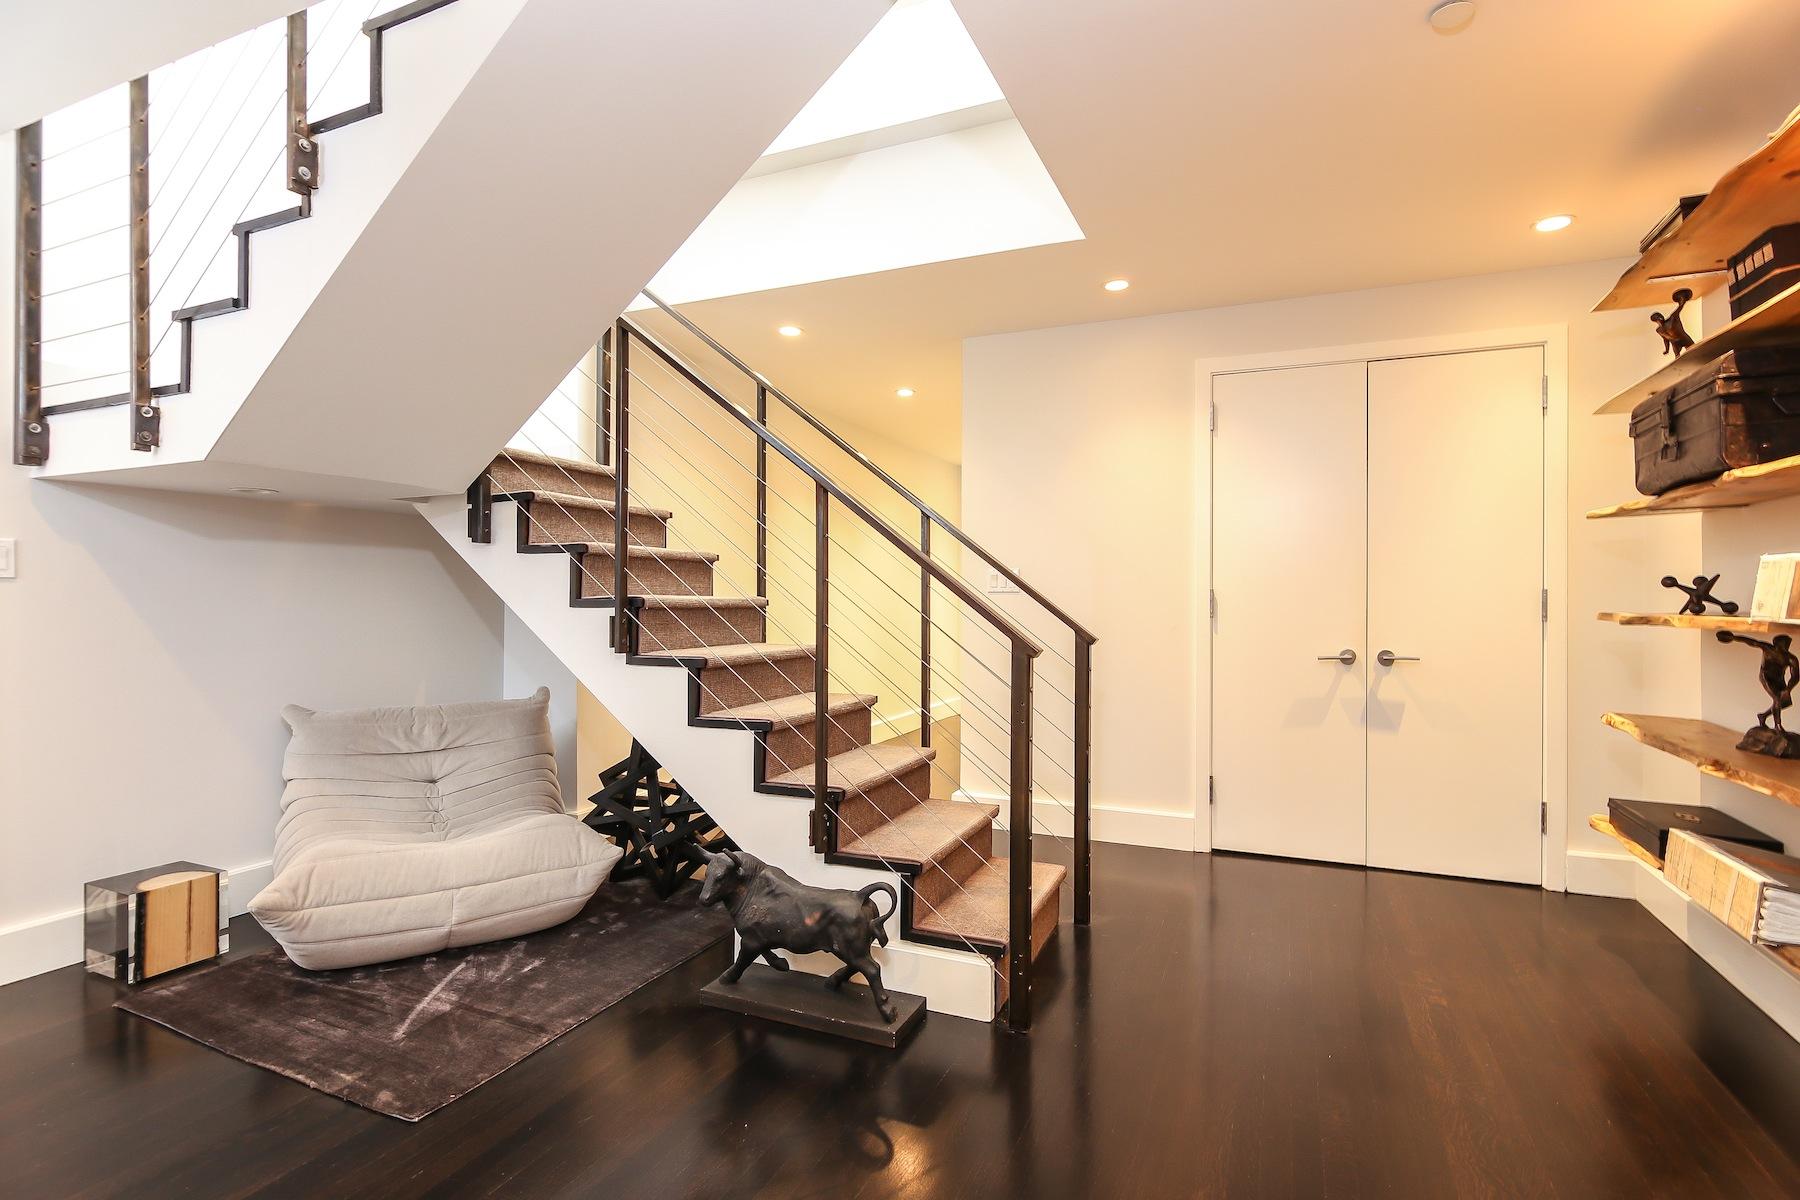 Additional photo for property listing at One Brooklyn Bridge 360 Furman Street Brooklyn, New York 11201 United States